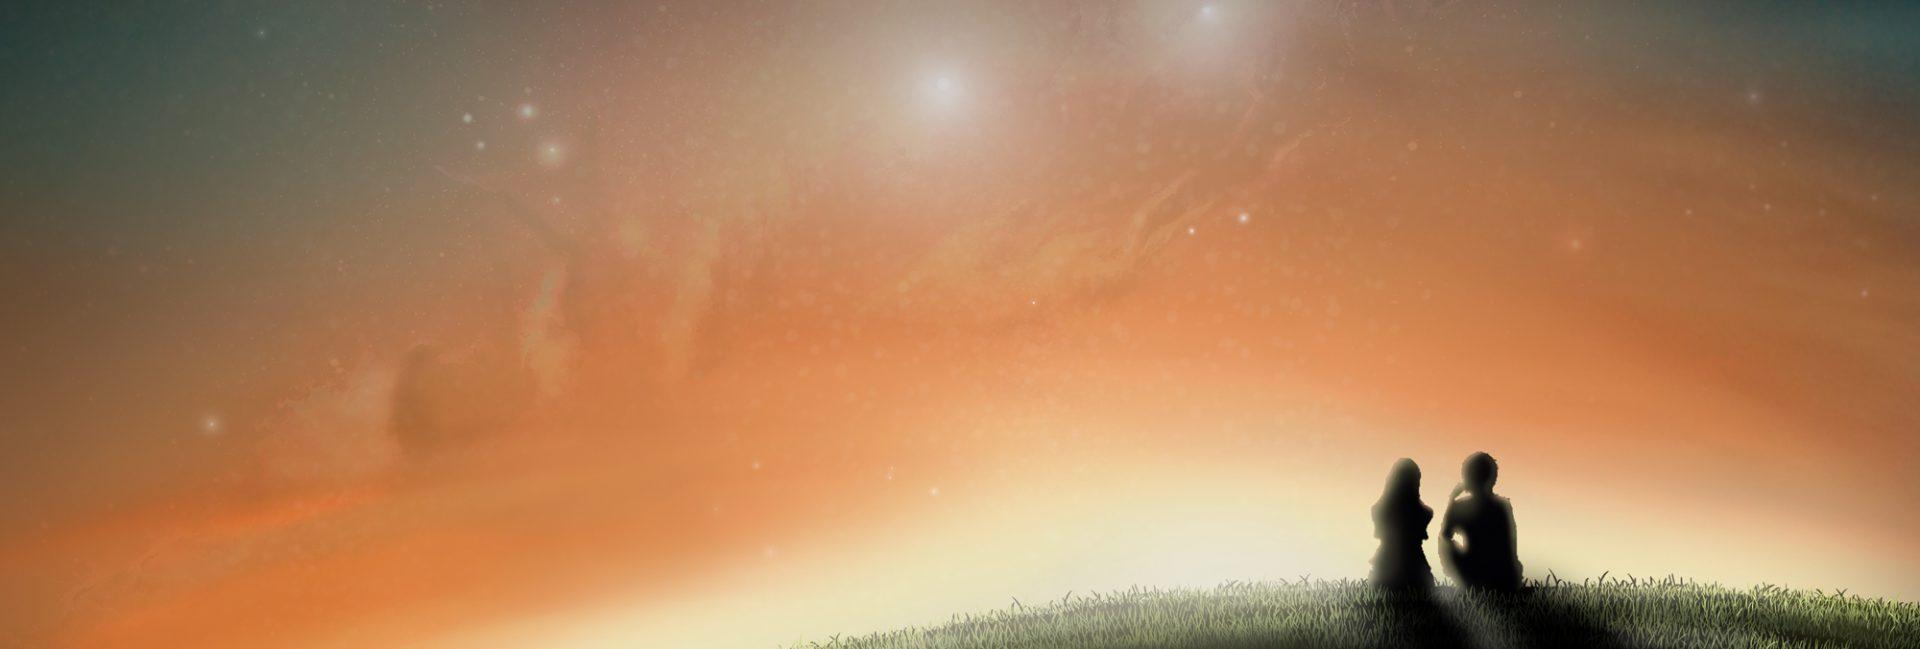 Super Seven - Like a Sky (Coverart)